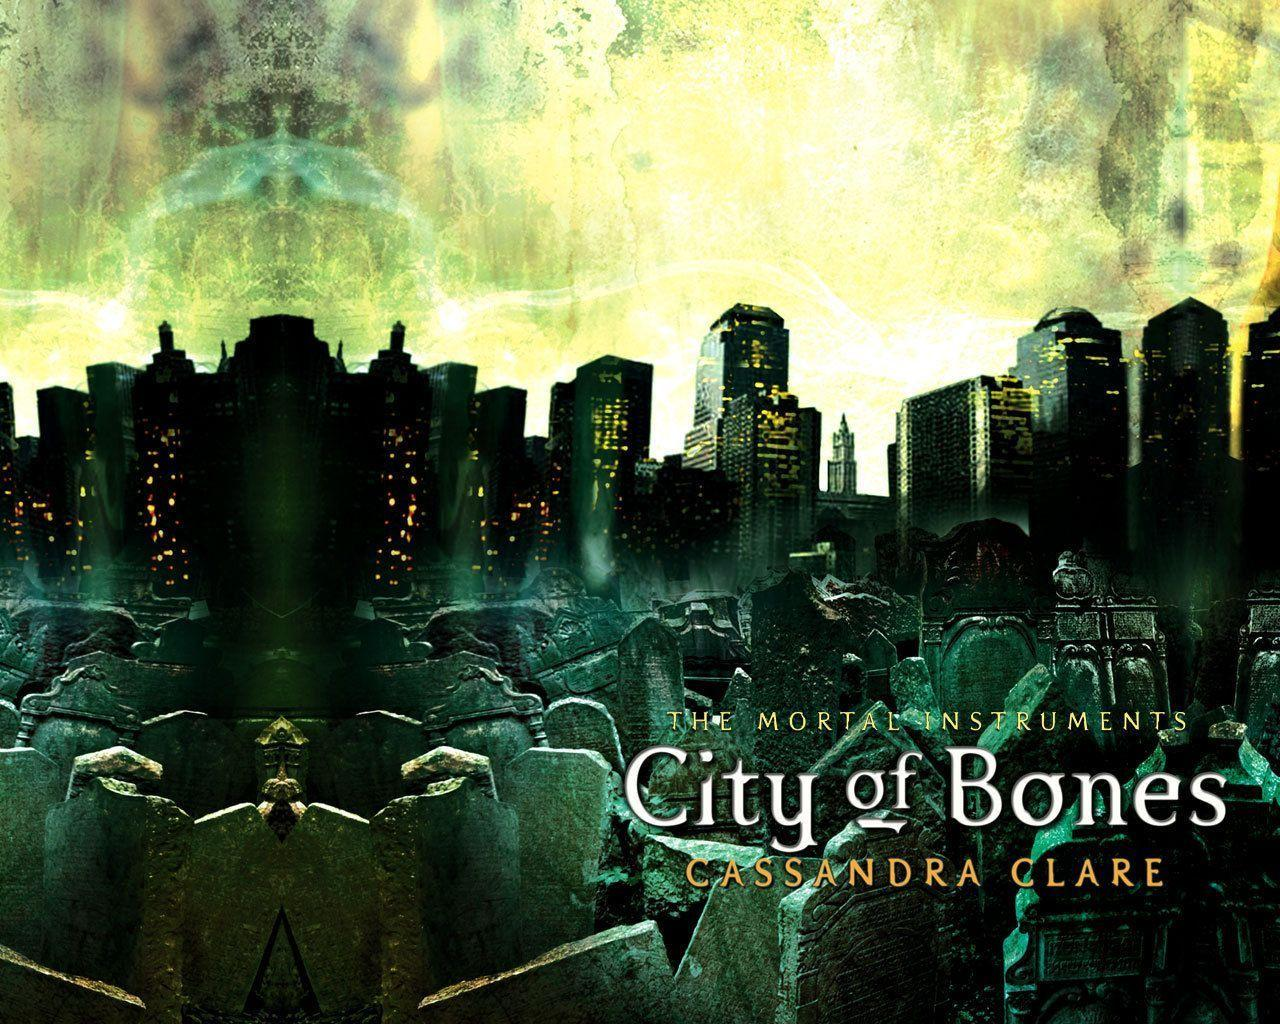 Create Quotes For Desktop Wallpaper City Of Bones Wallpapers Wallpaper Cave